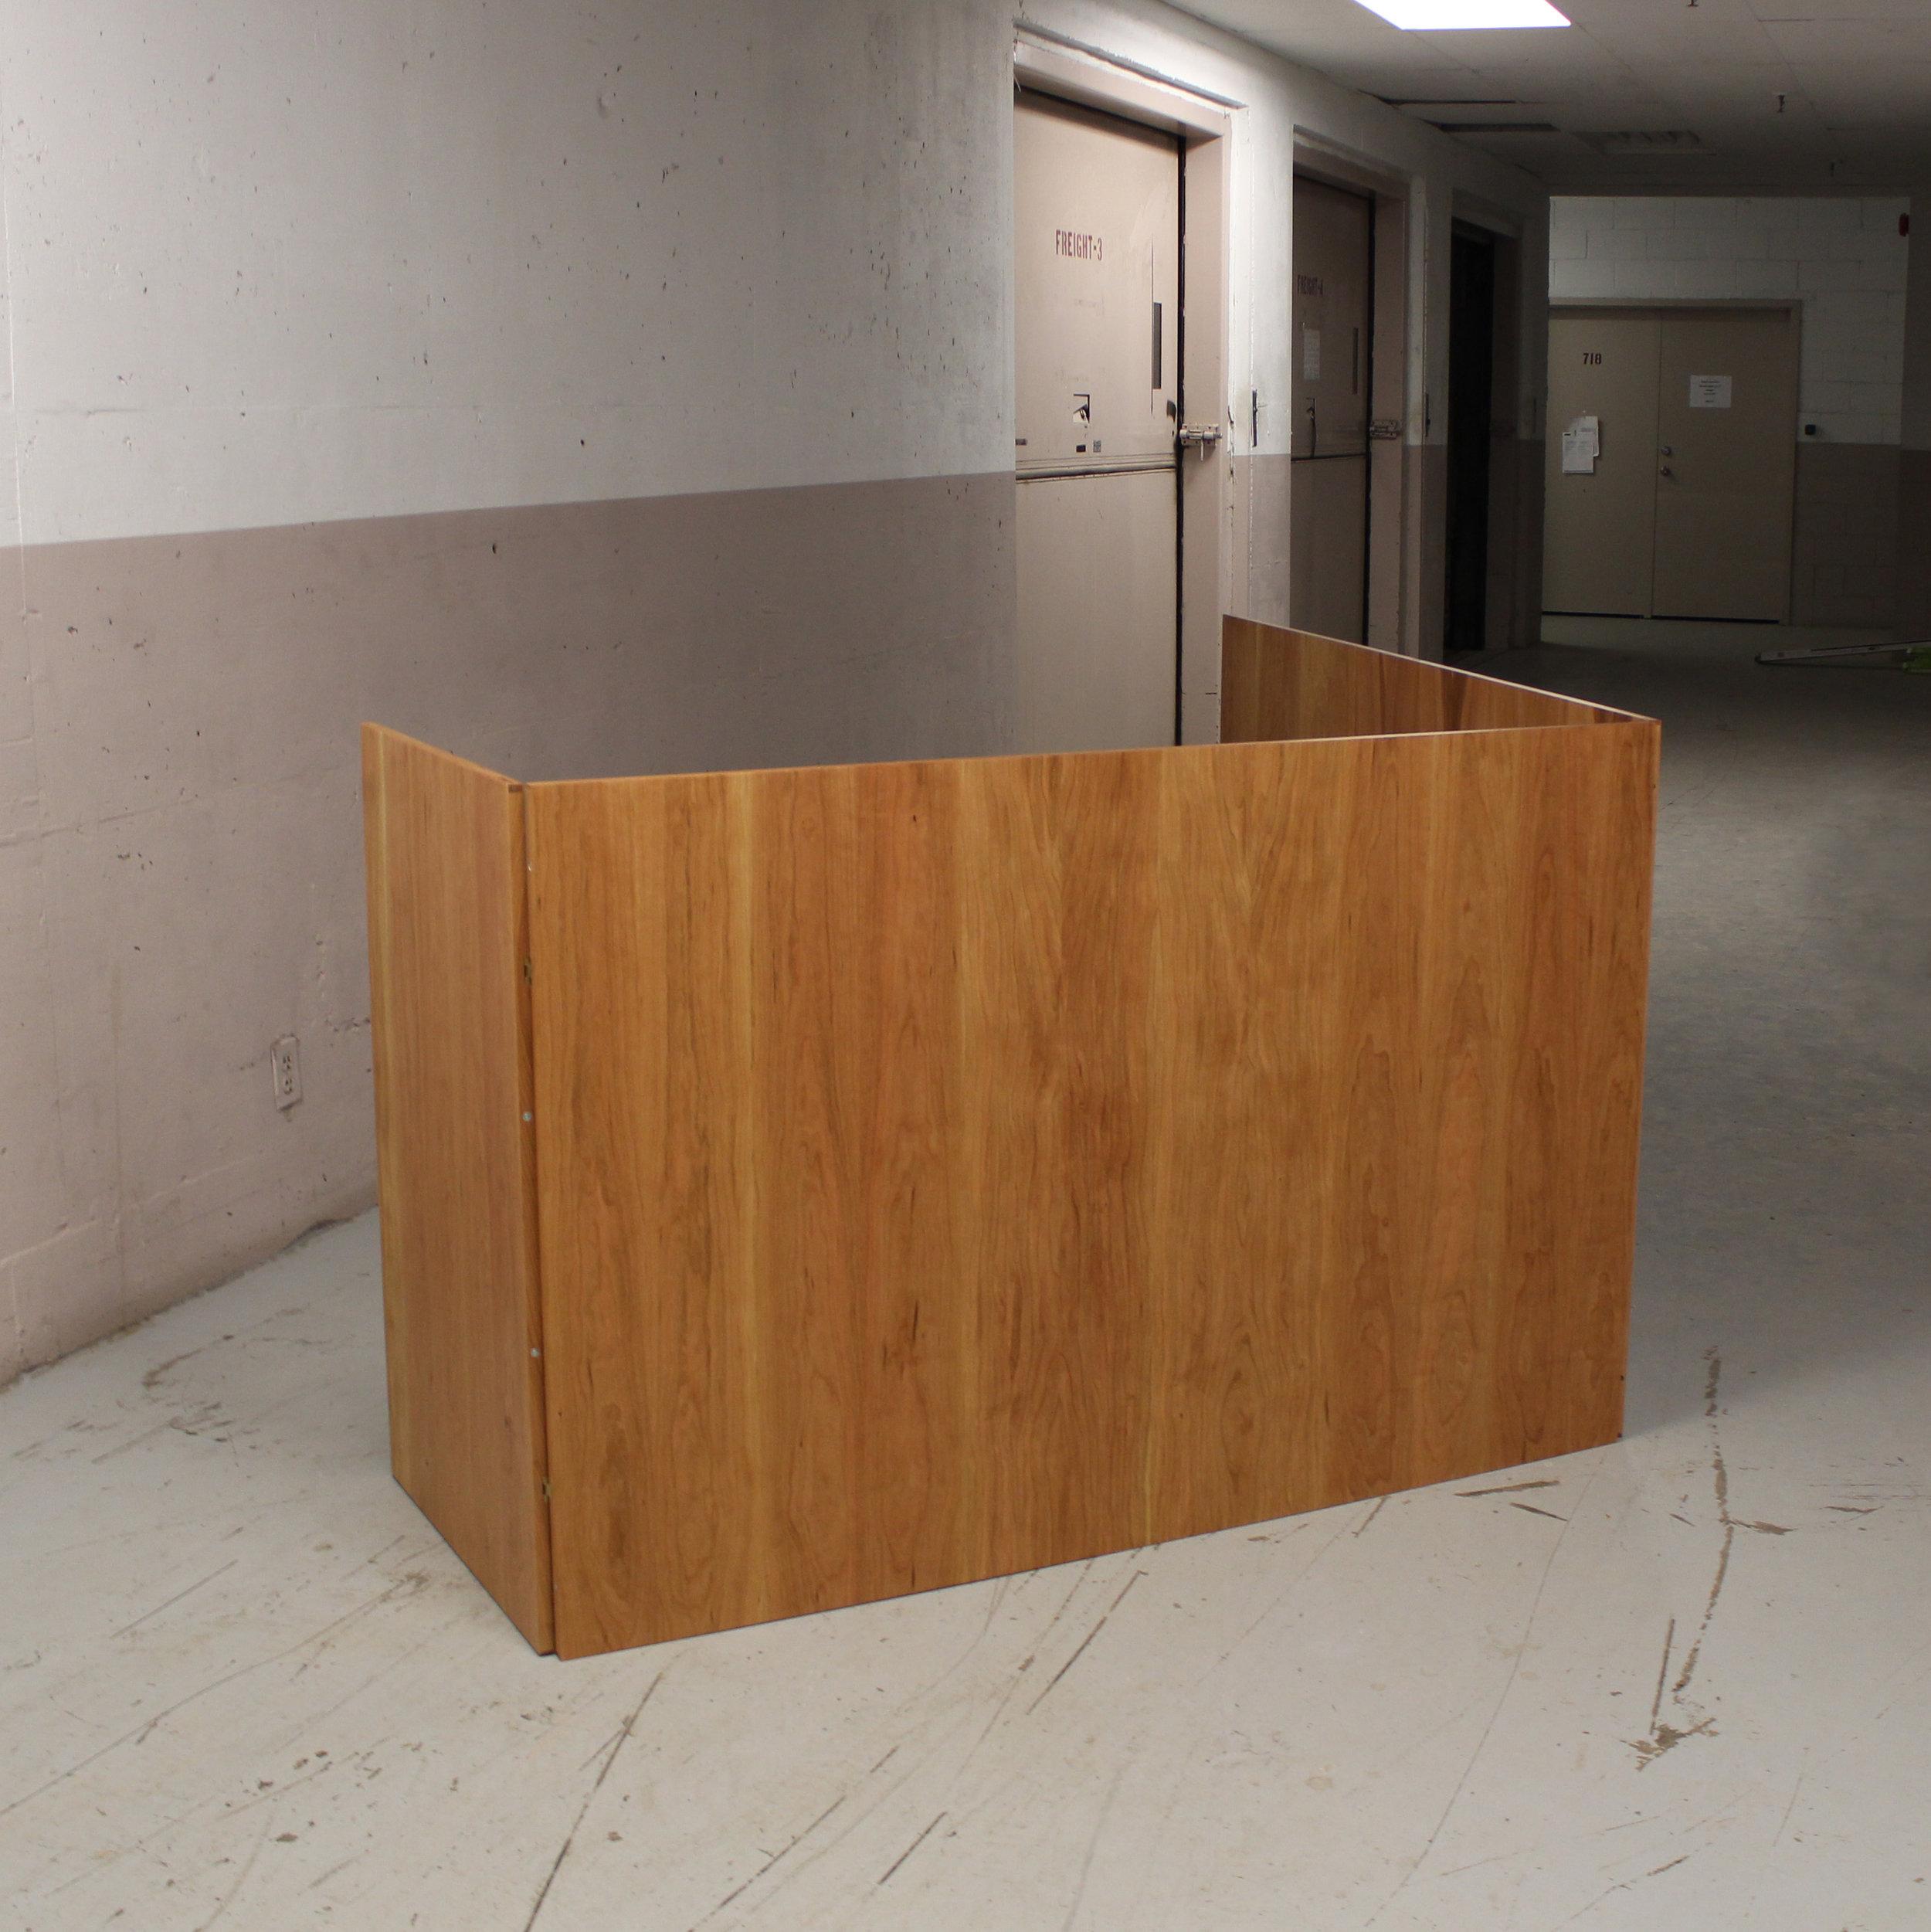 emma senft screen in hallway